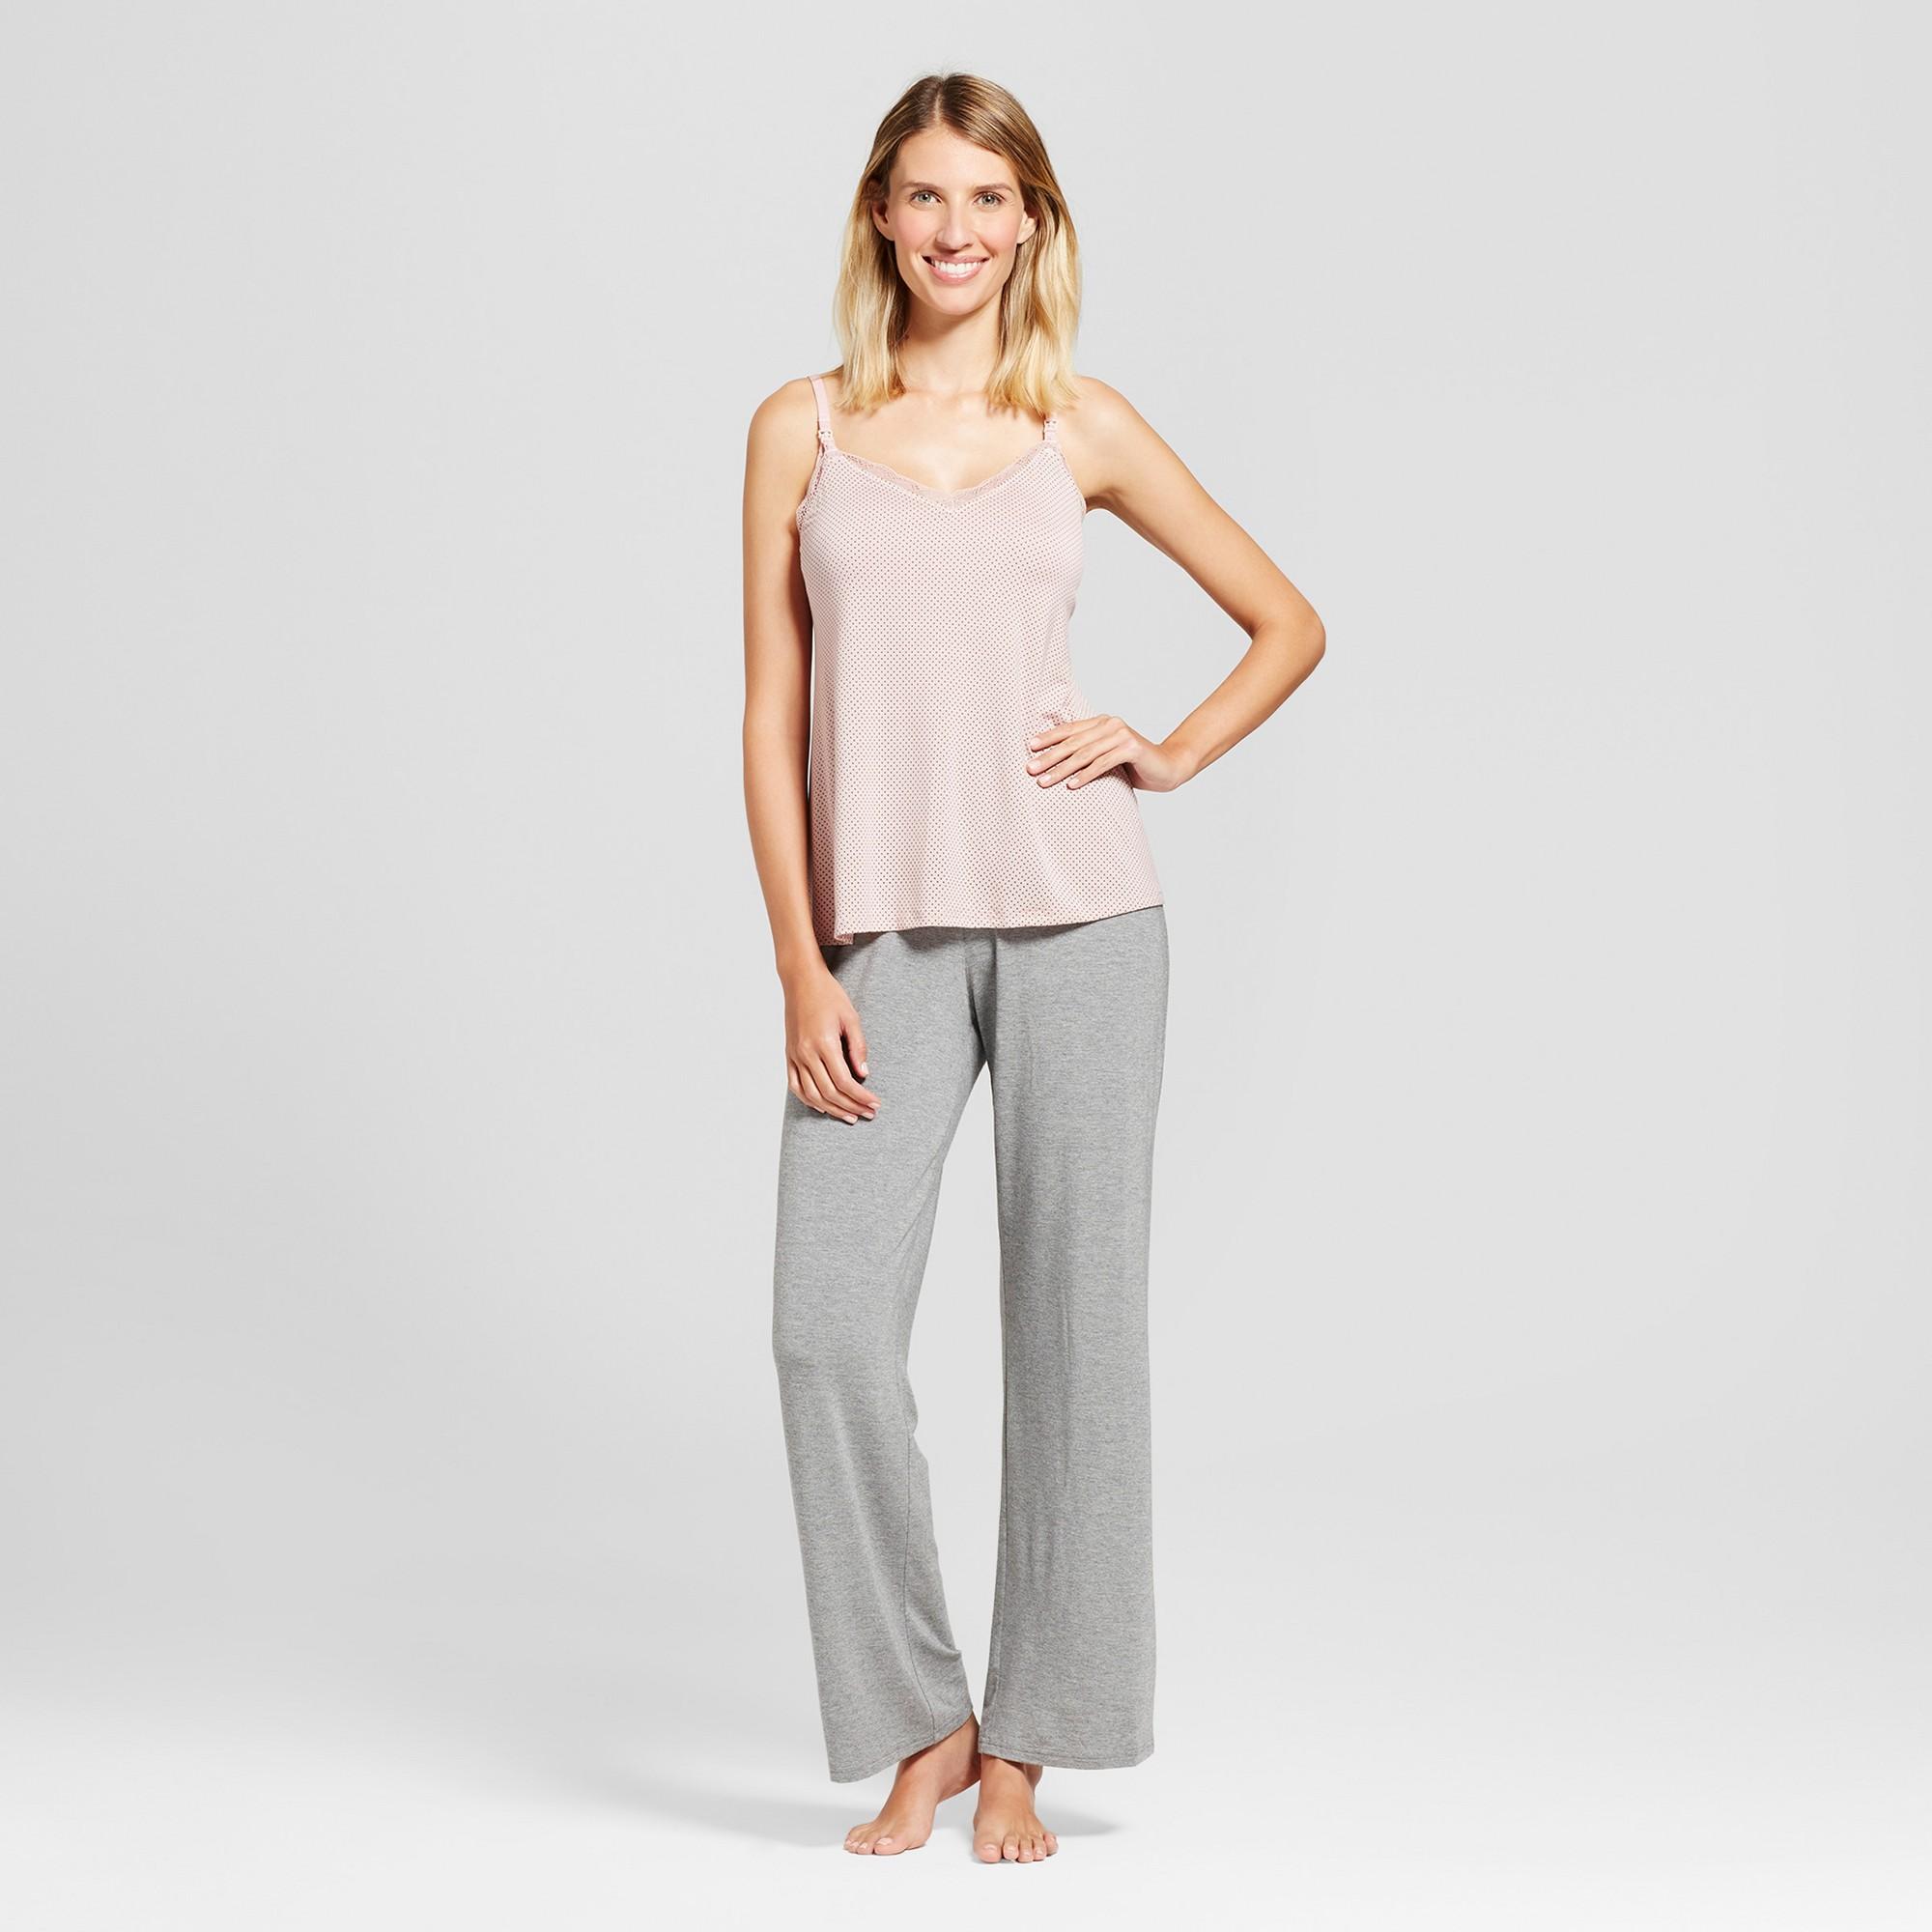 e9db88c6e1 Maternity Nursing 3pc Pajama Set Medium Heather Gray Xxl